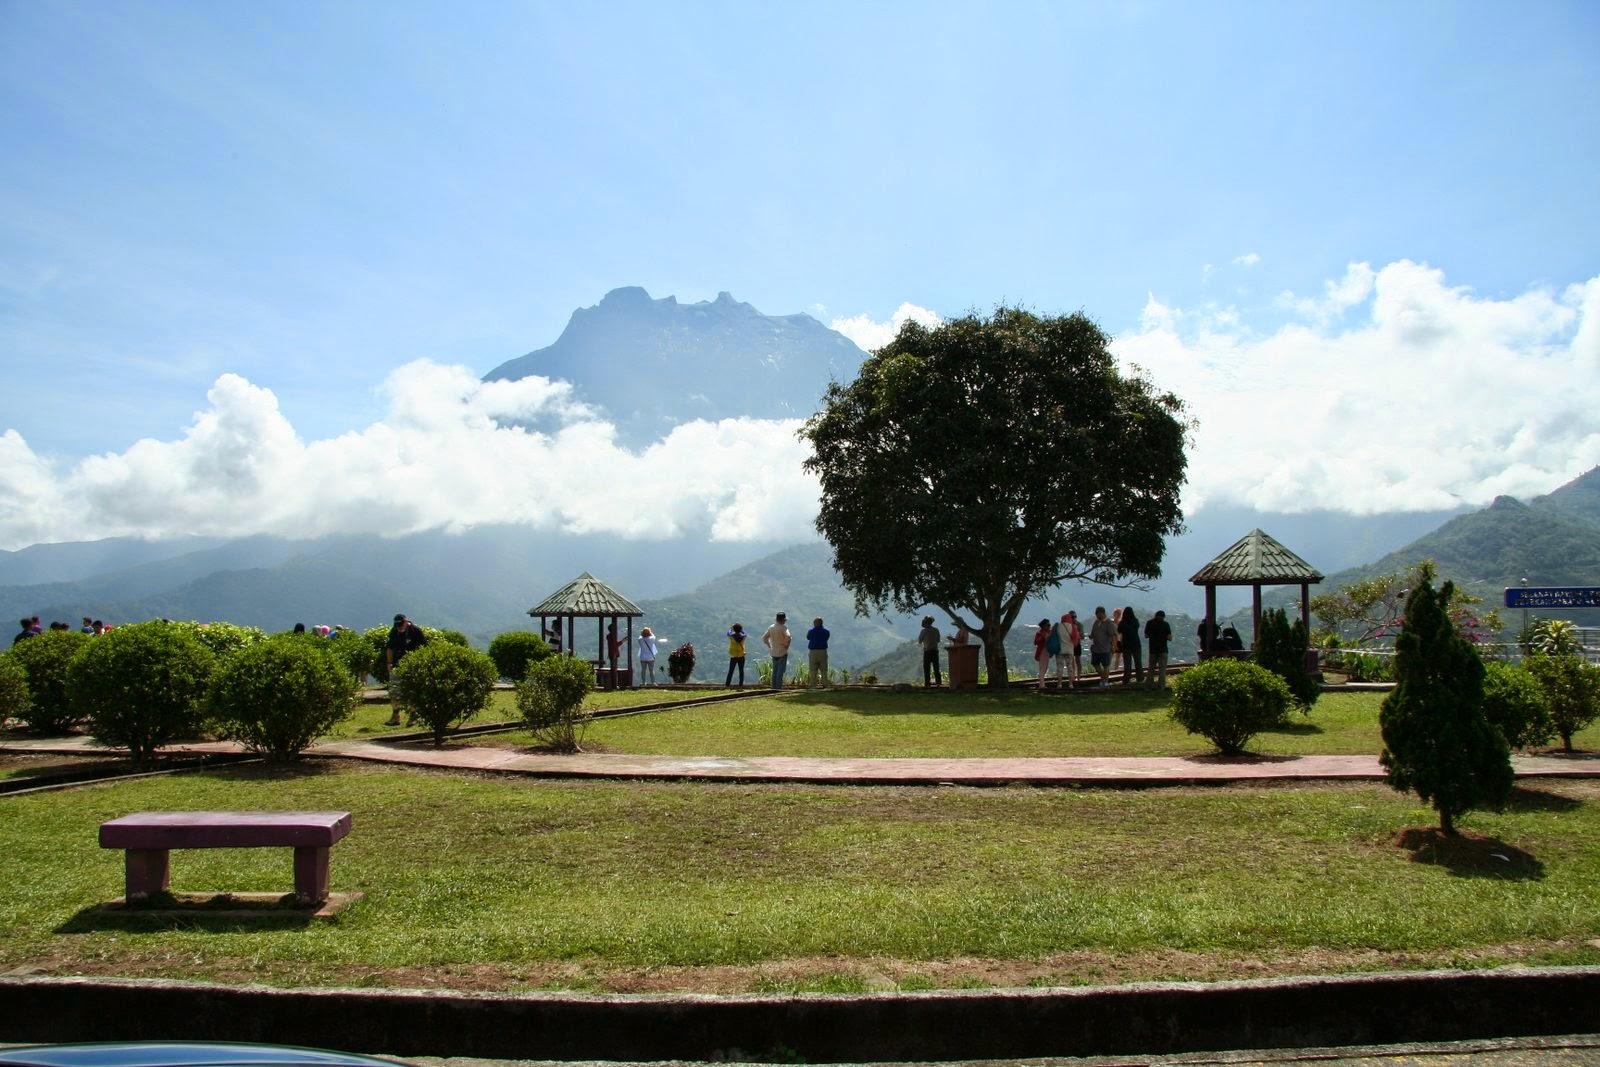 Garden Park of Pekan Nabalu (Nabalu Town) Mount Kinabalu